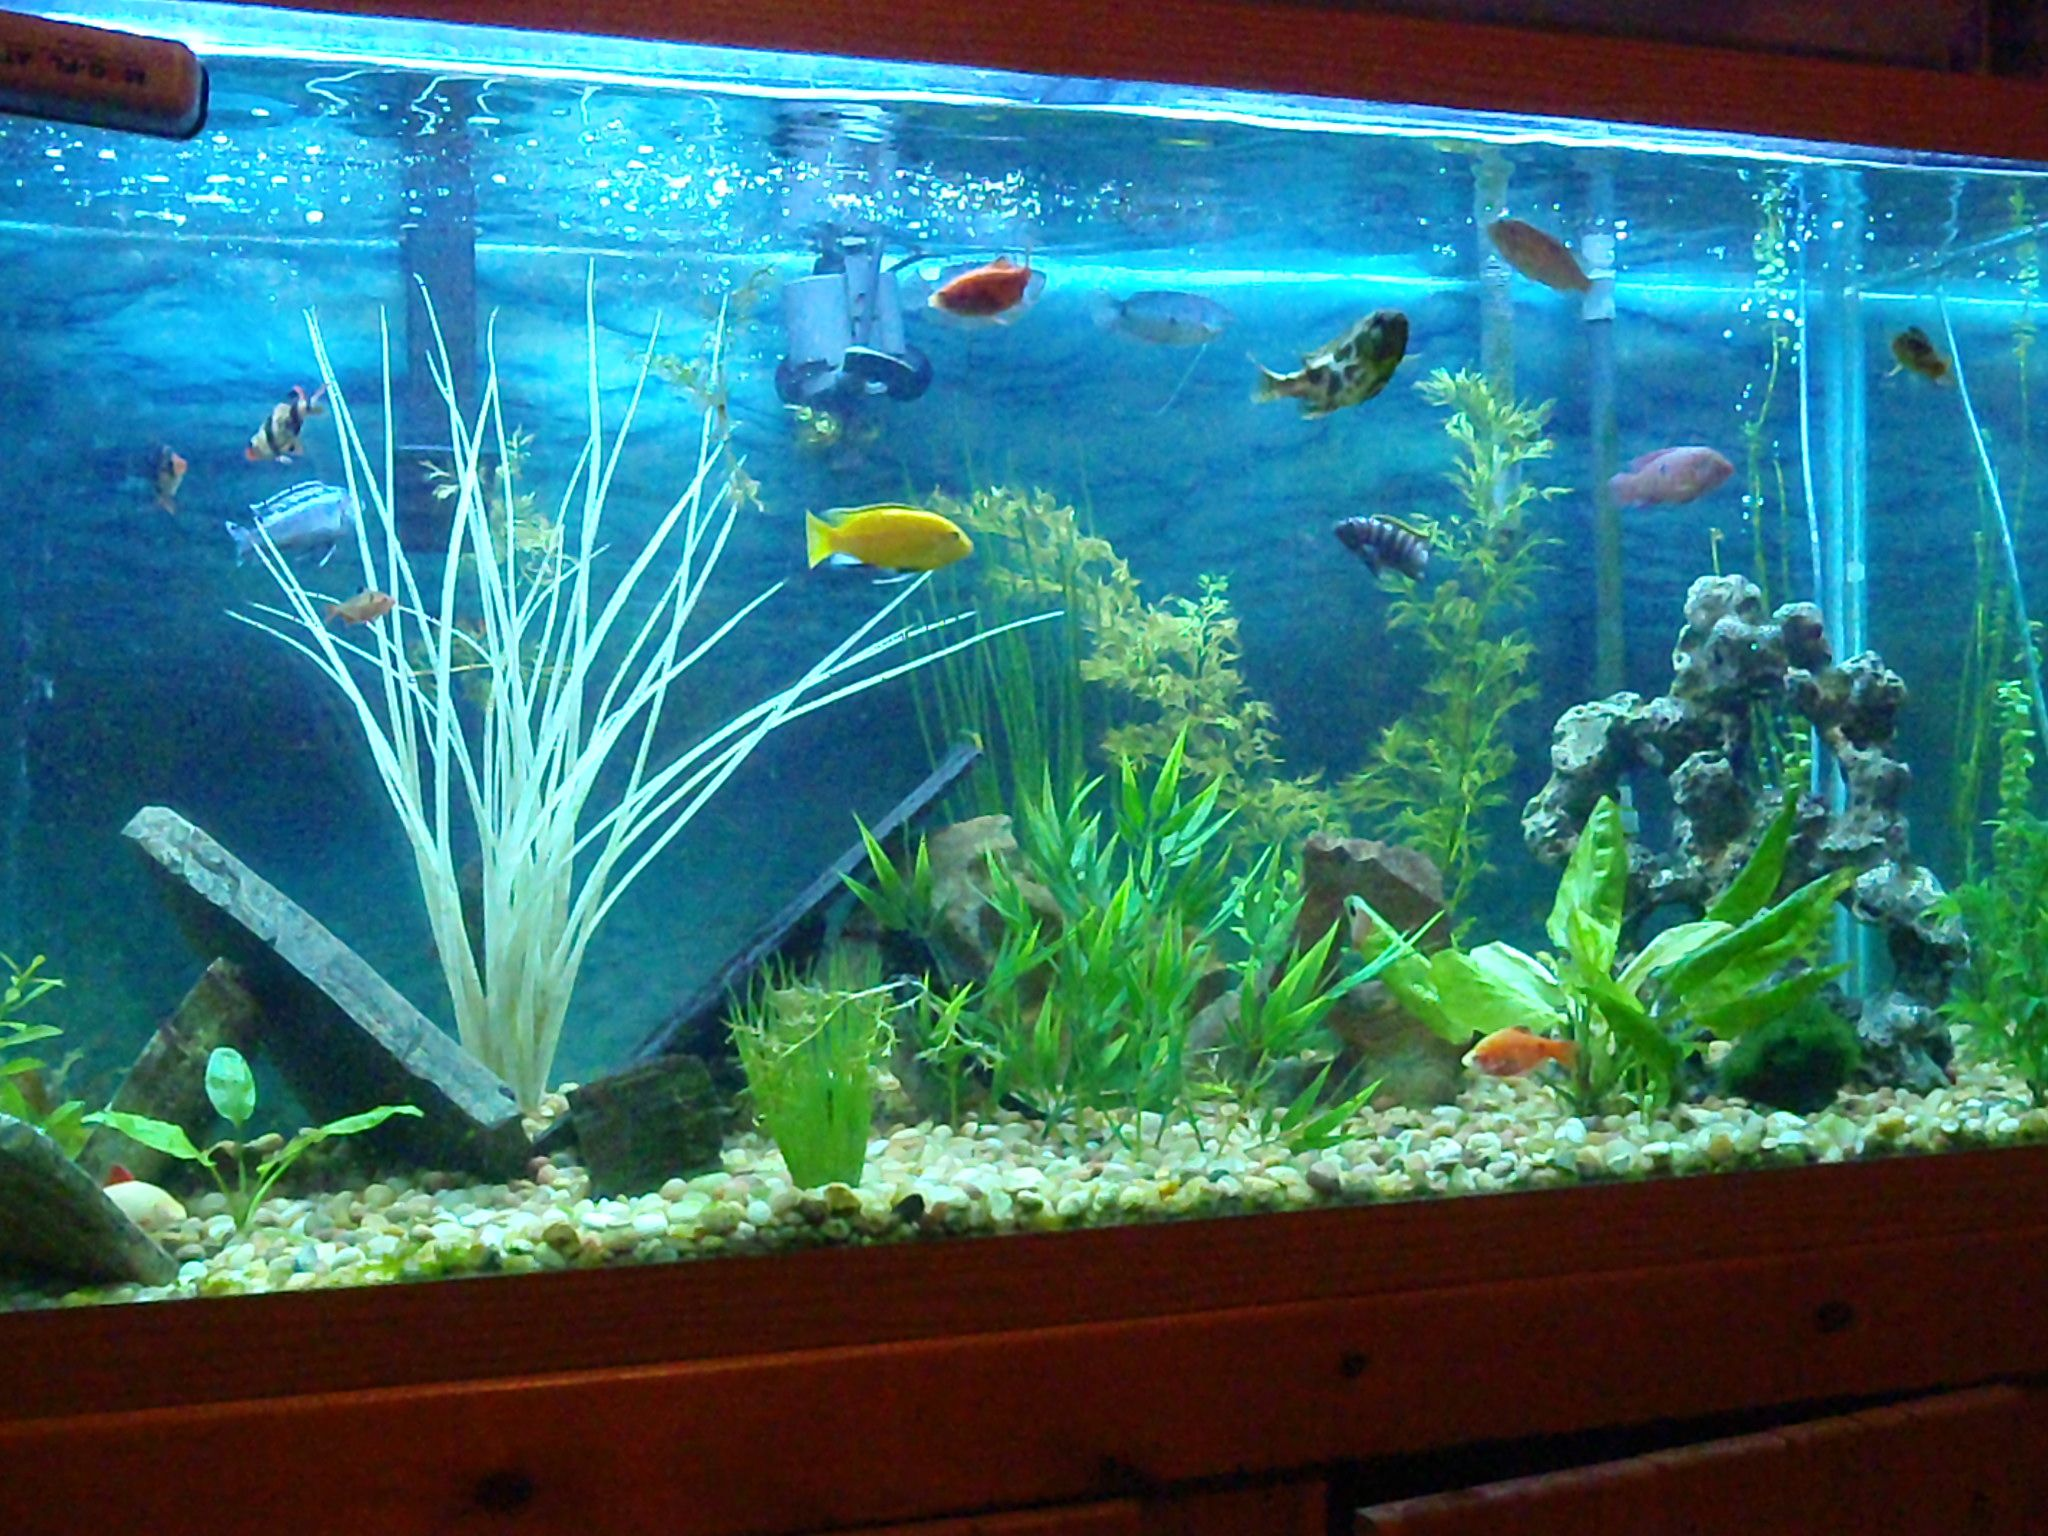 Freshwater aquarium fish info - African Ciclid Tank Fish Africanciclid Freshwater